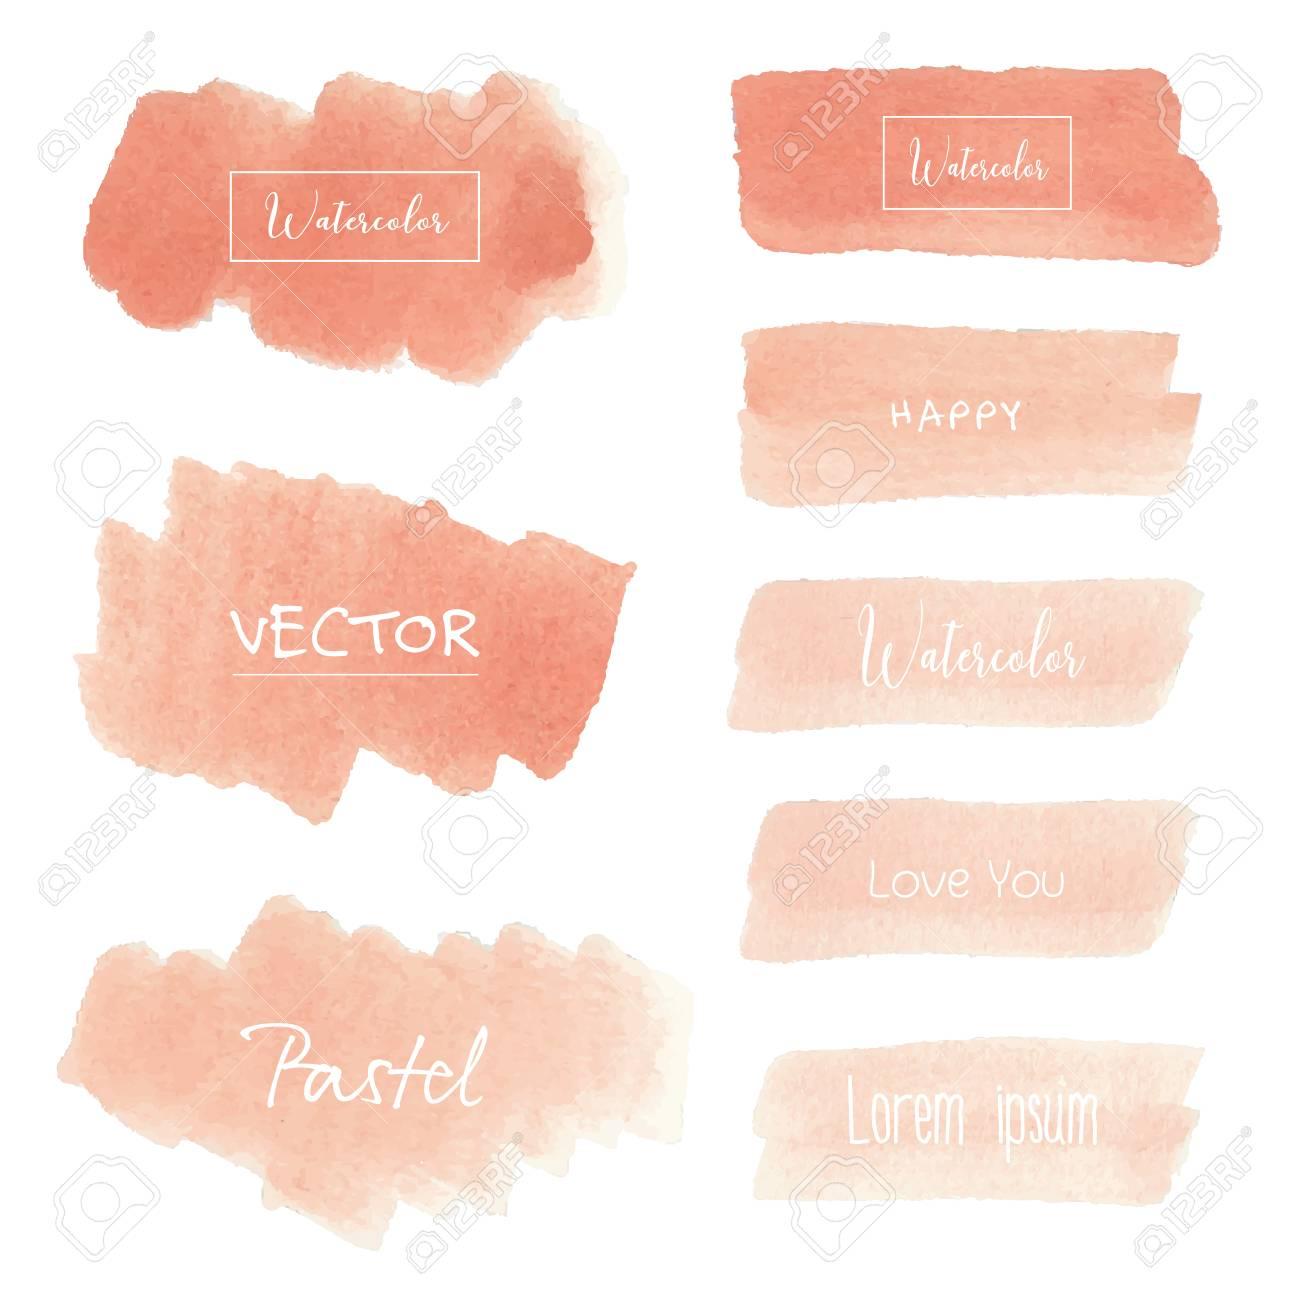 Peach watercolor background, Pastel watercolor, Vector illustration. - 110576243